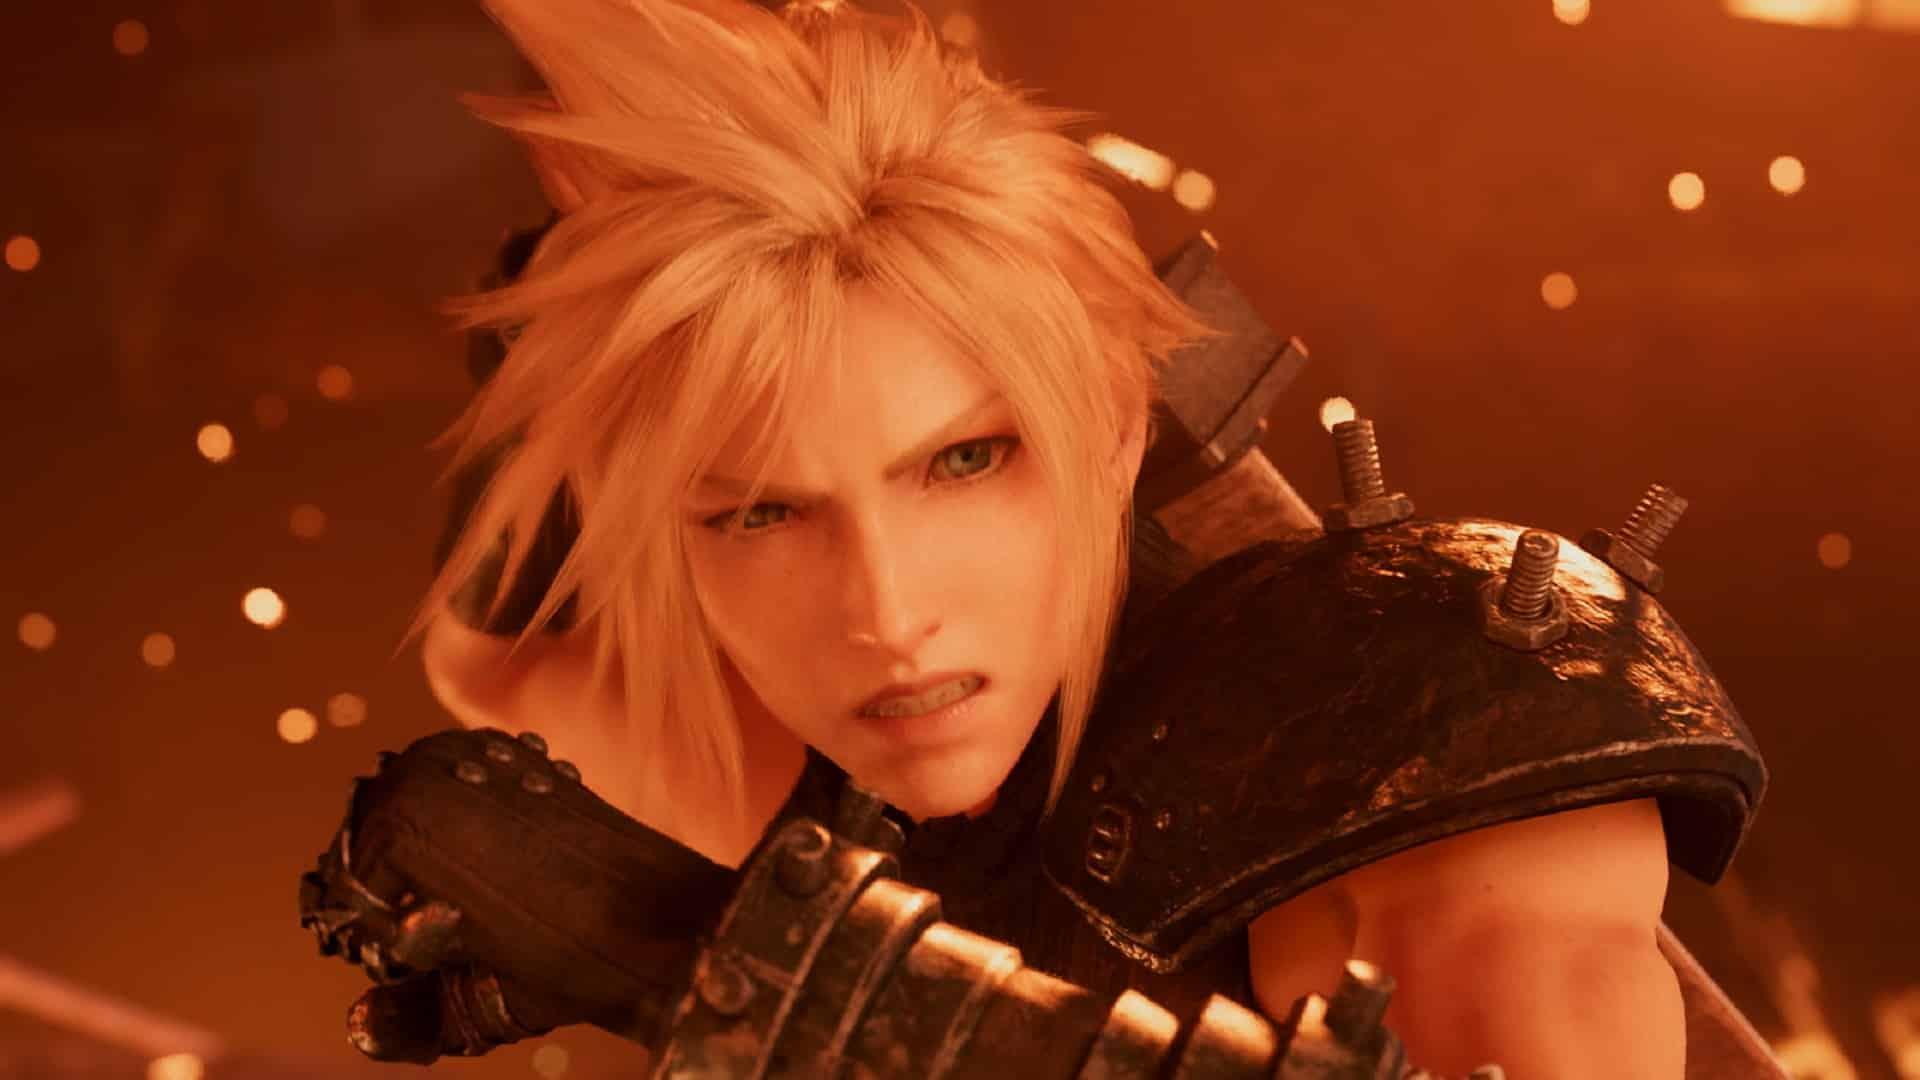 Final Fantasy VII Remake trailer Sony Square Enix PS4 TGS 2019